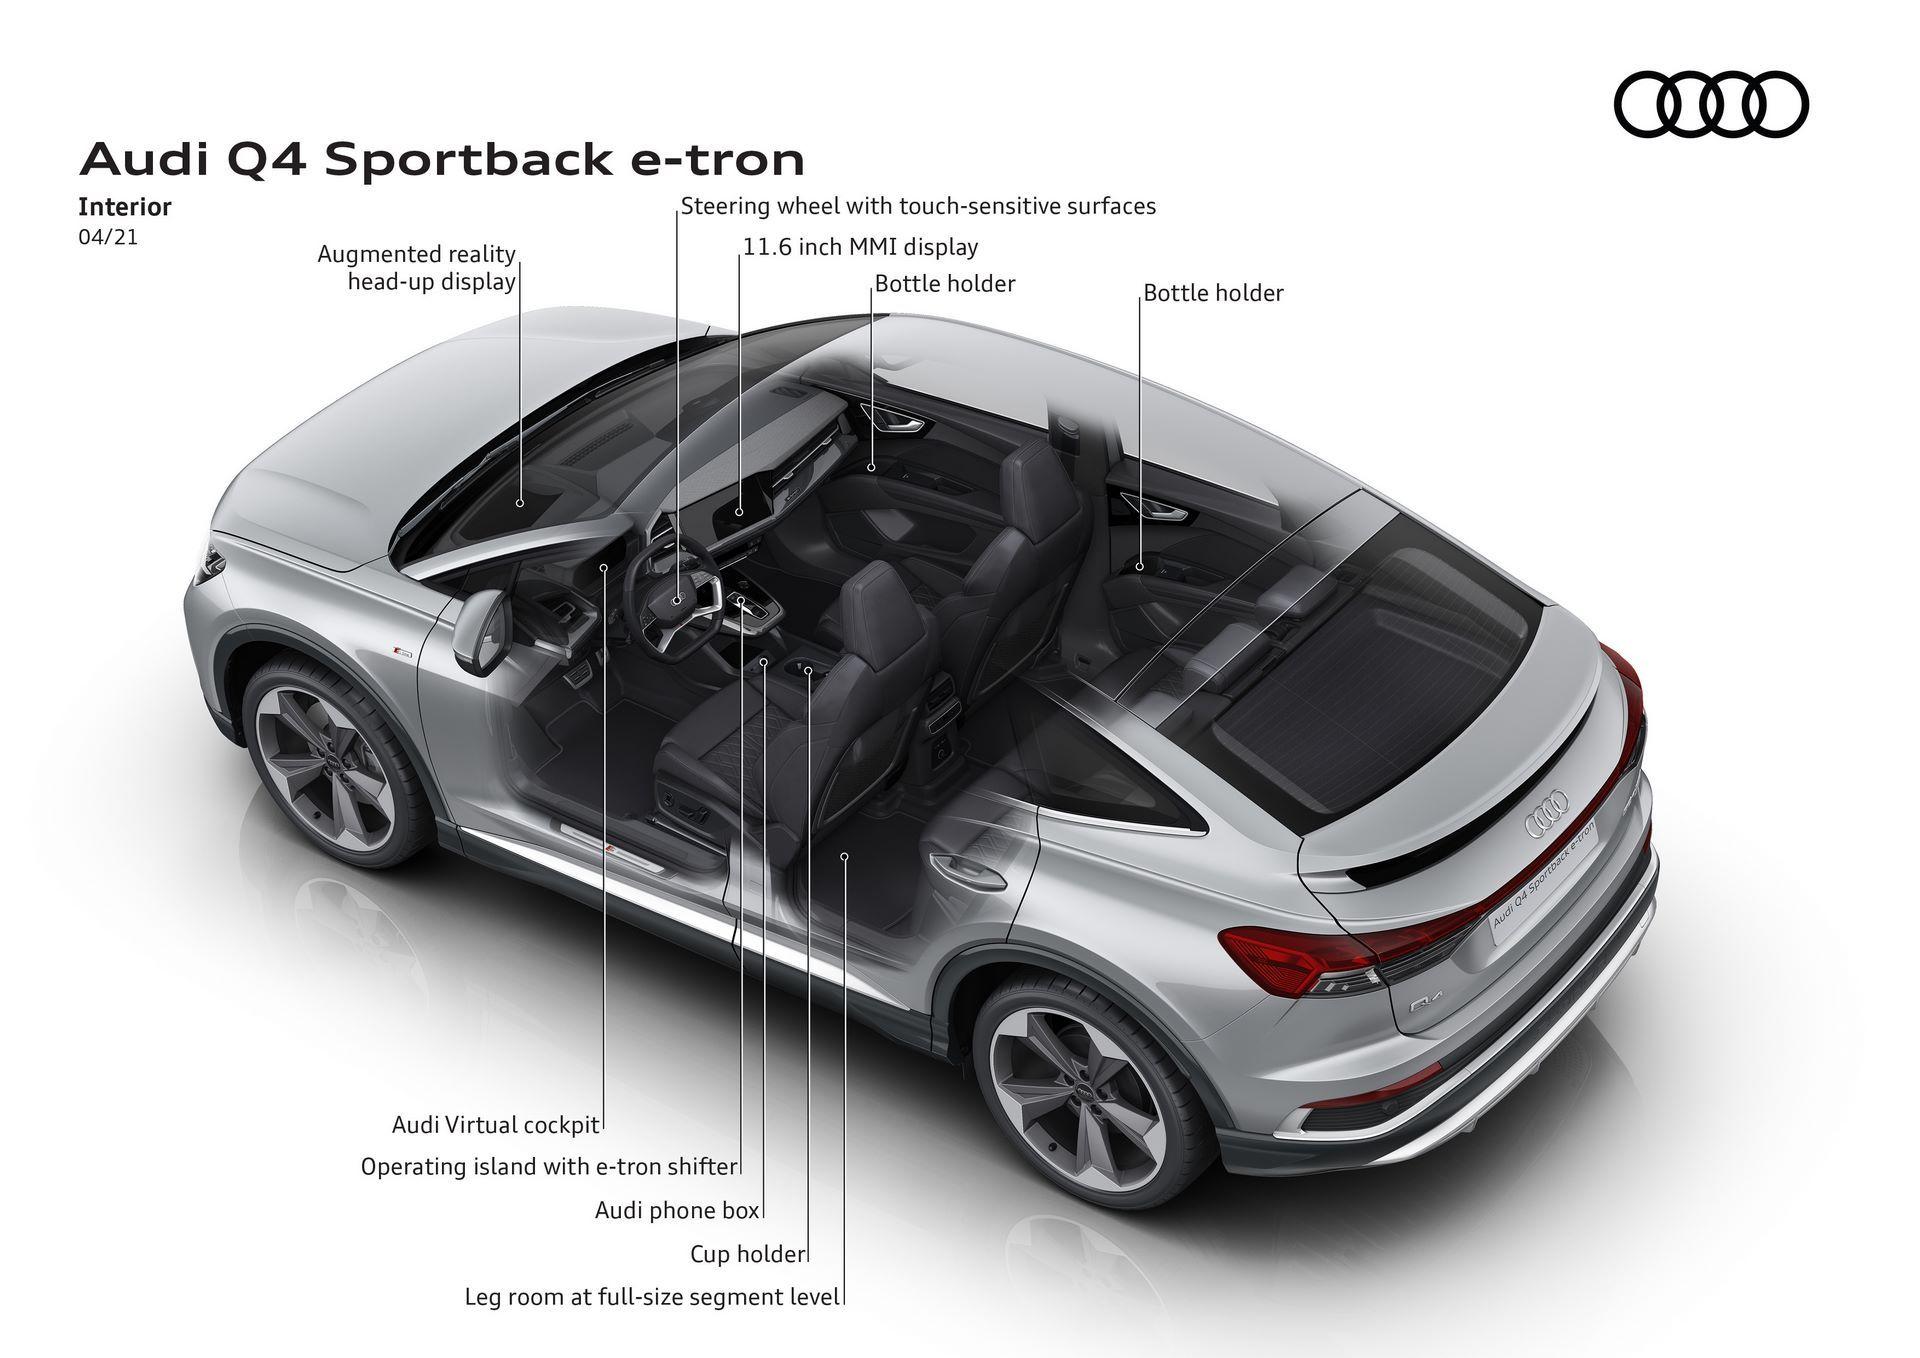 Audi-Q4-e-tron-and-Q4-e-tron-Sportback-136